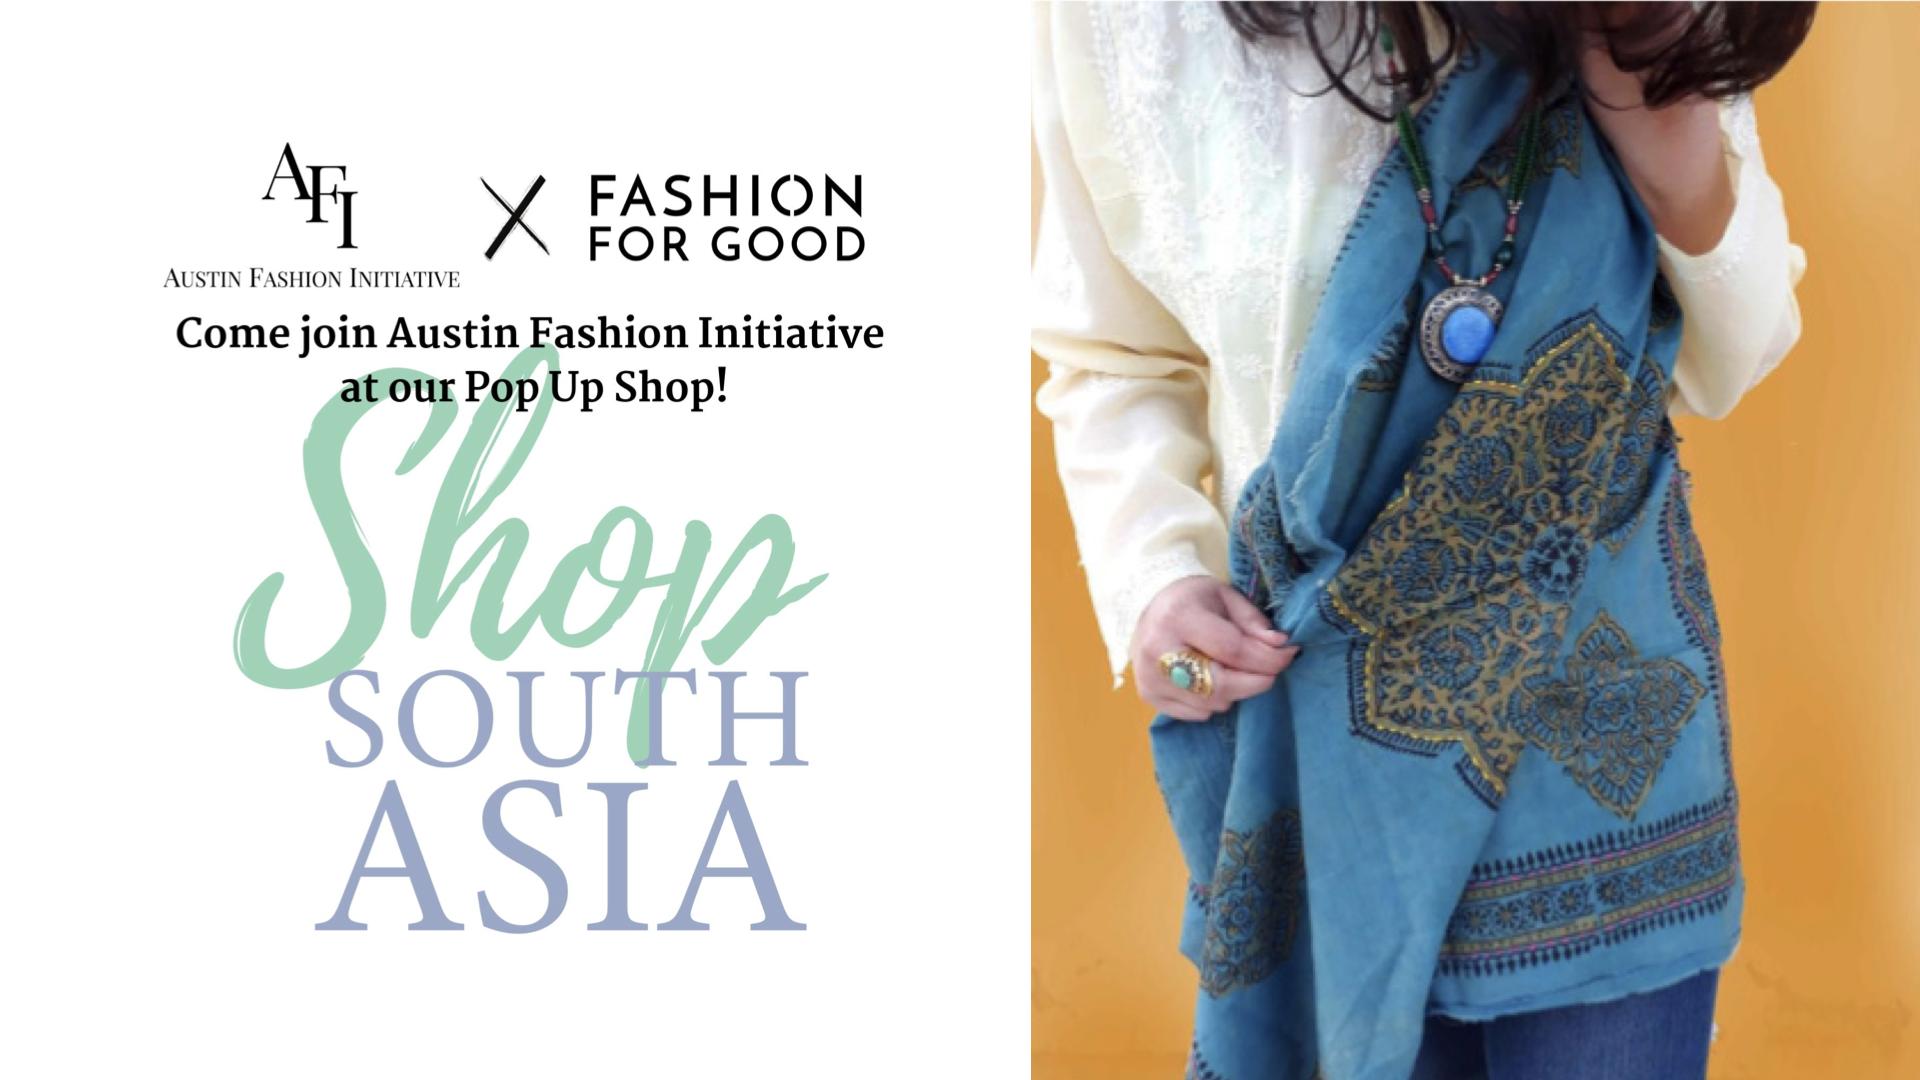 AustinFashionInitiative-FashionForGood.png